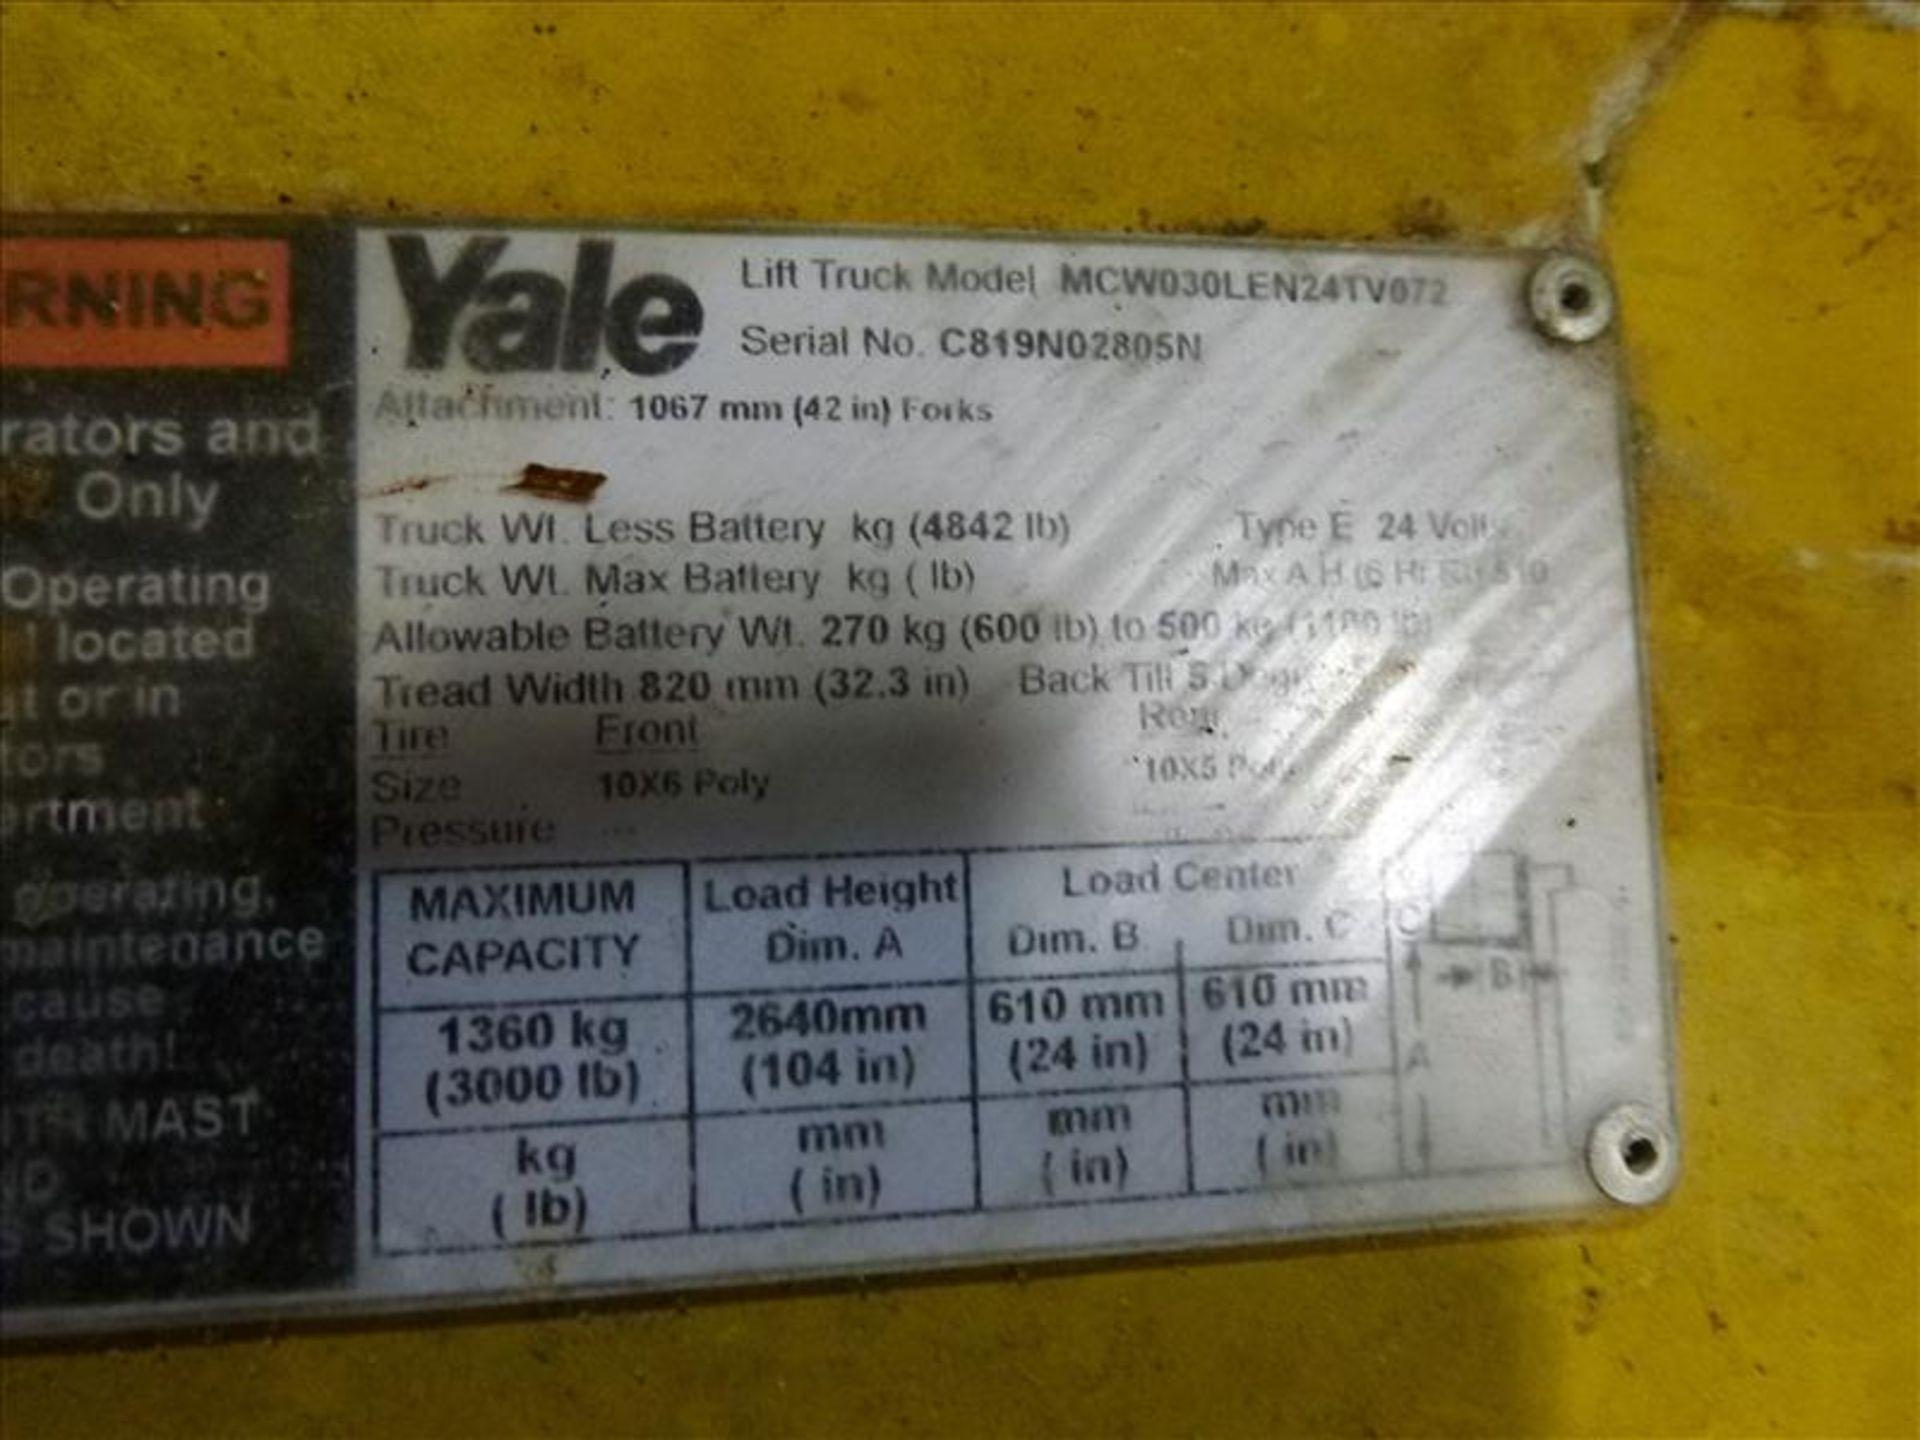 Lot 2021 - Yale walk-behind fork lift truck, mod. MCW030LEN24TV072, ser. no. C819N02805N, 24V electric, 3000